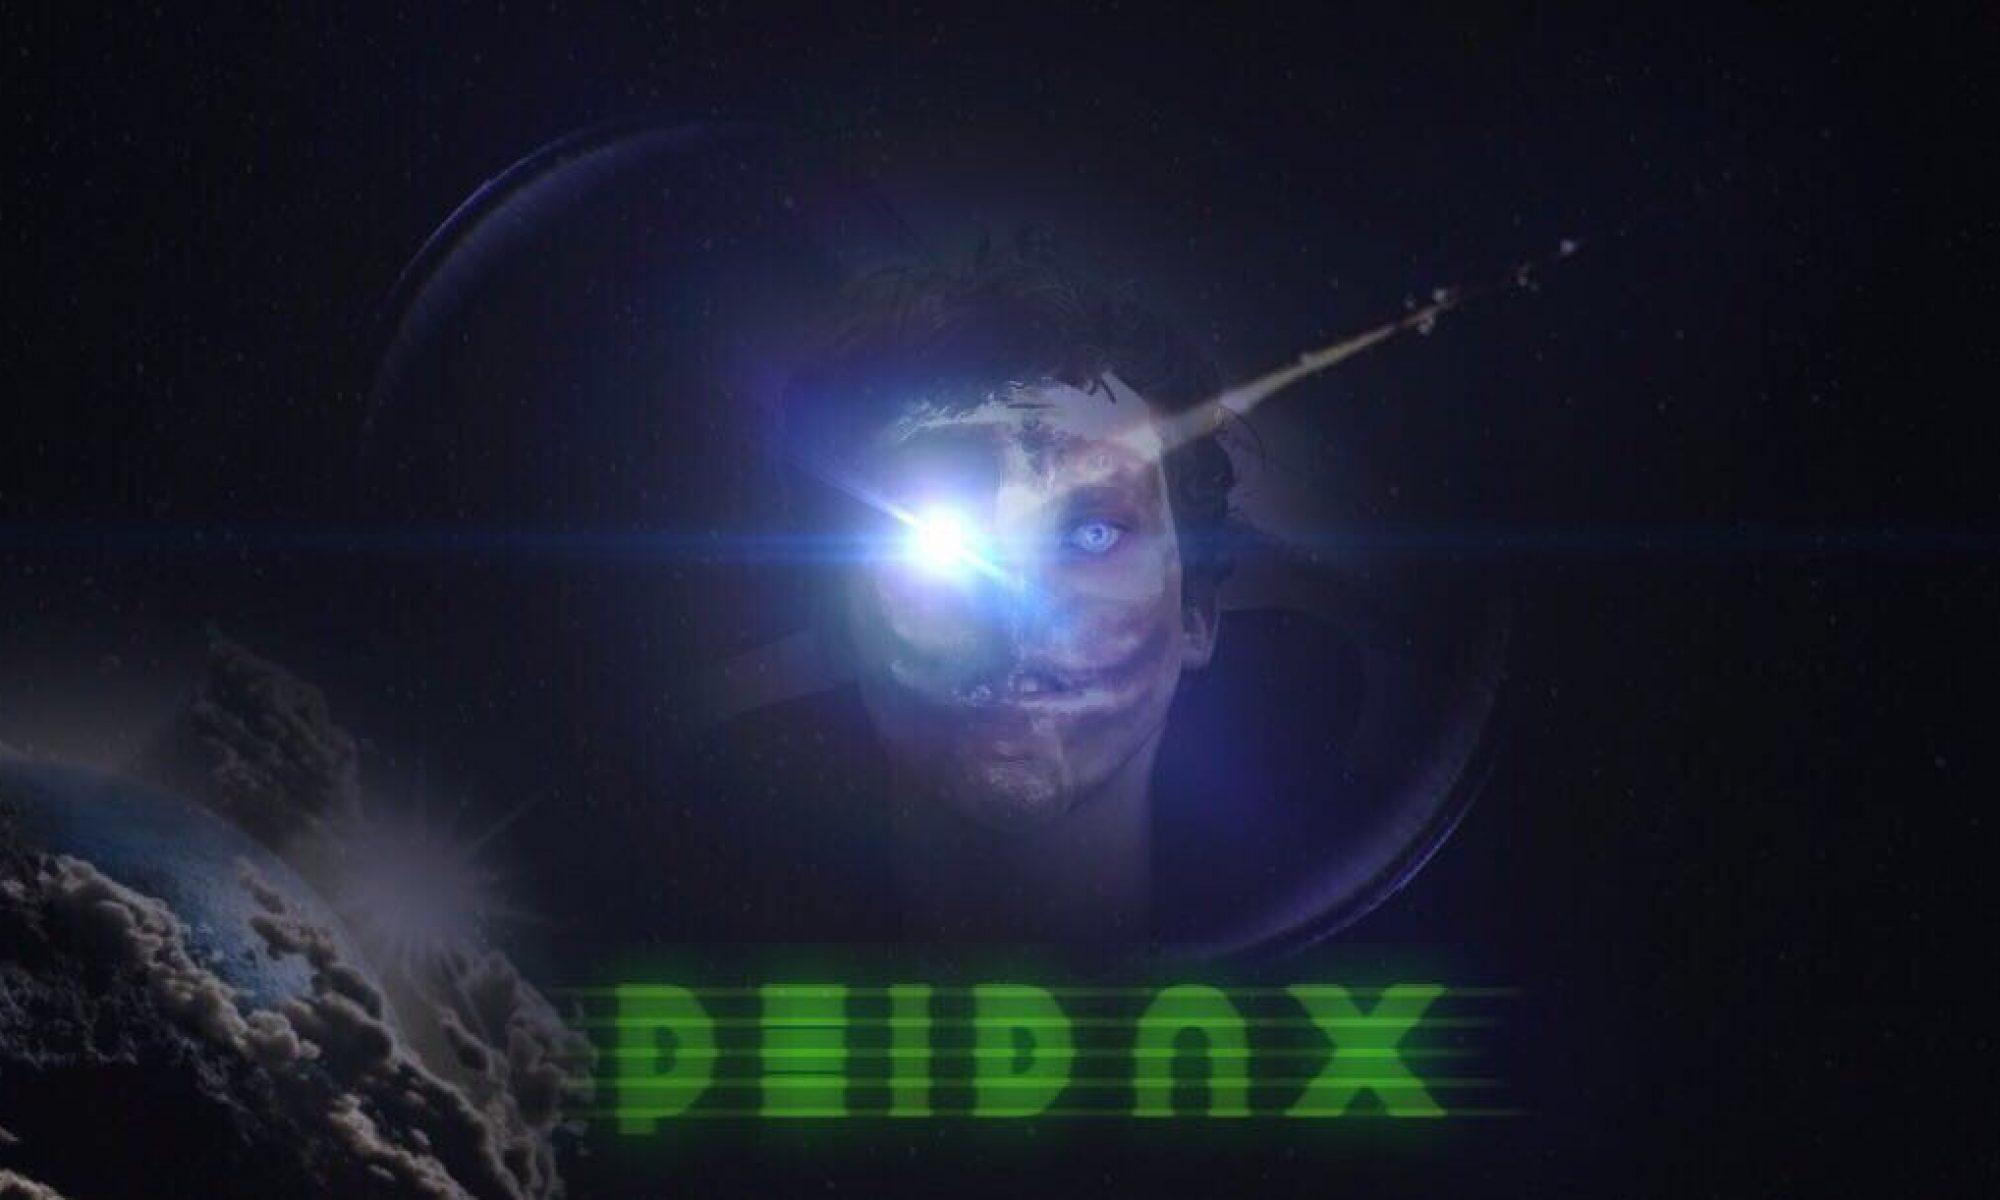 P E I D A X